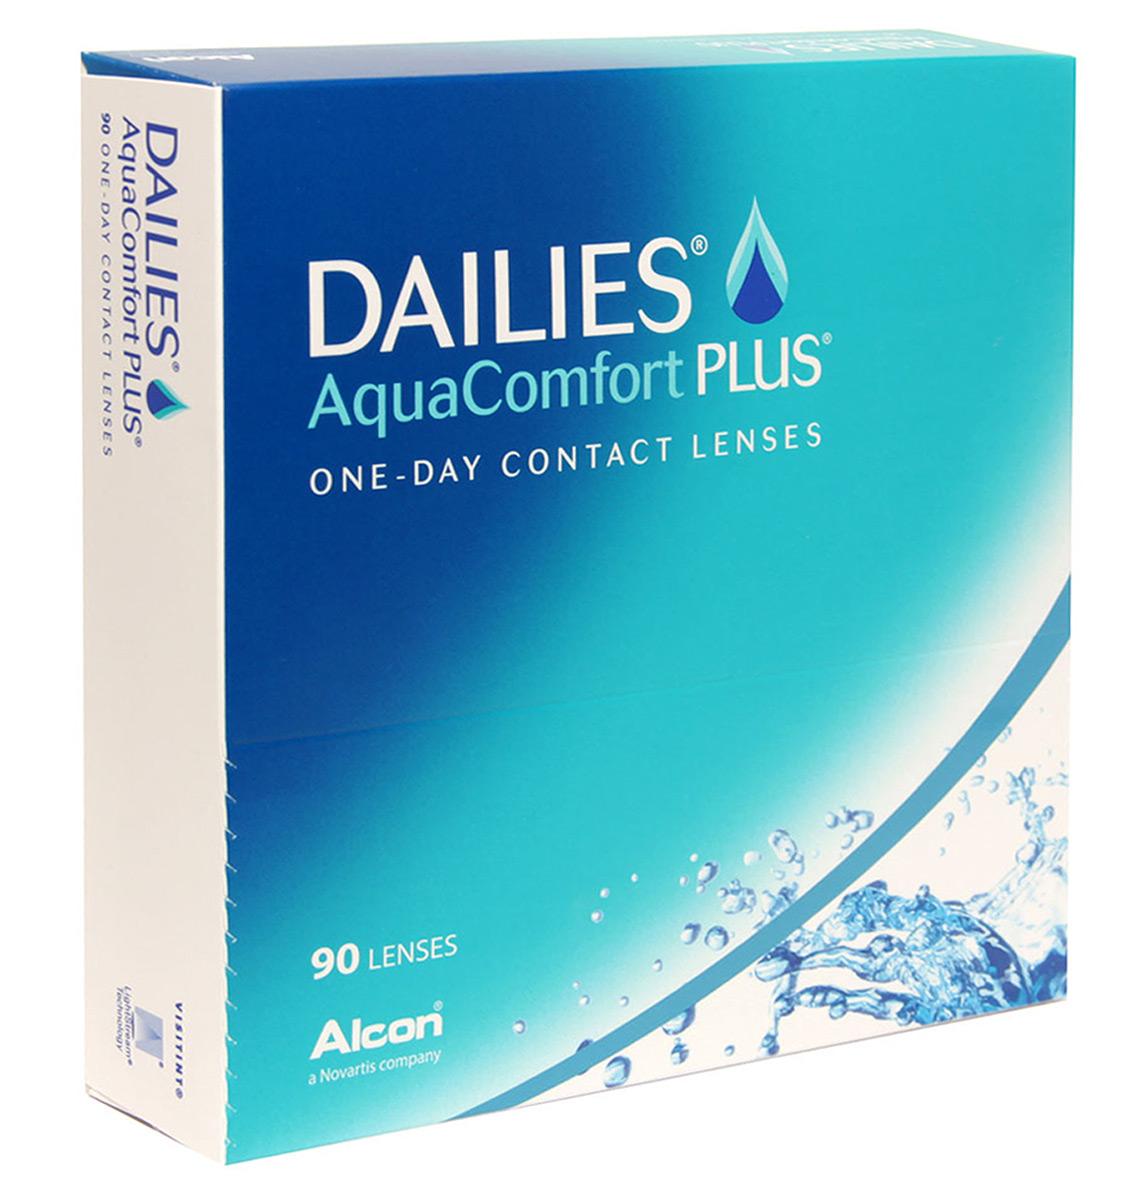 Alcon-CIBA Vision контактные линзы Dailies AquaComfort Plus (90шт / 8.7 / 14.0 / -0.50)